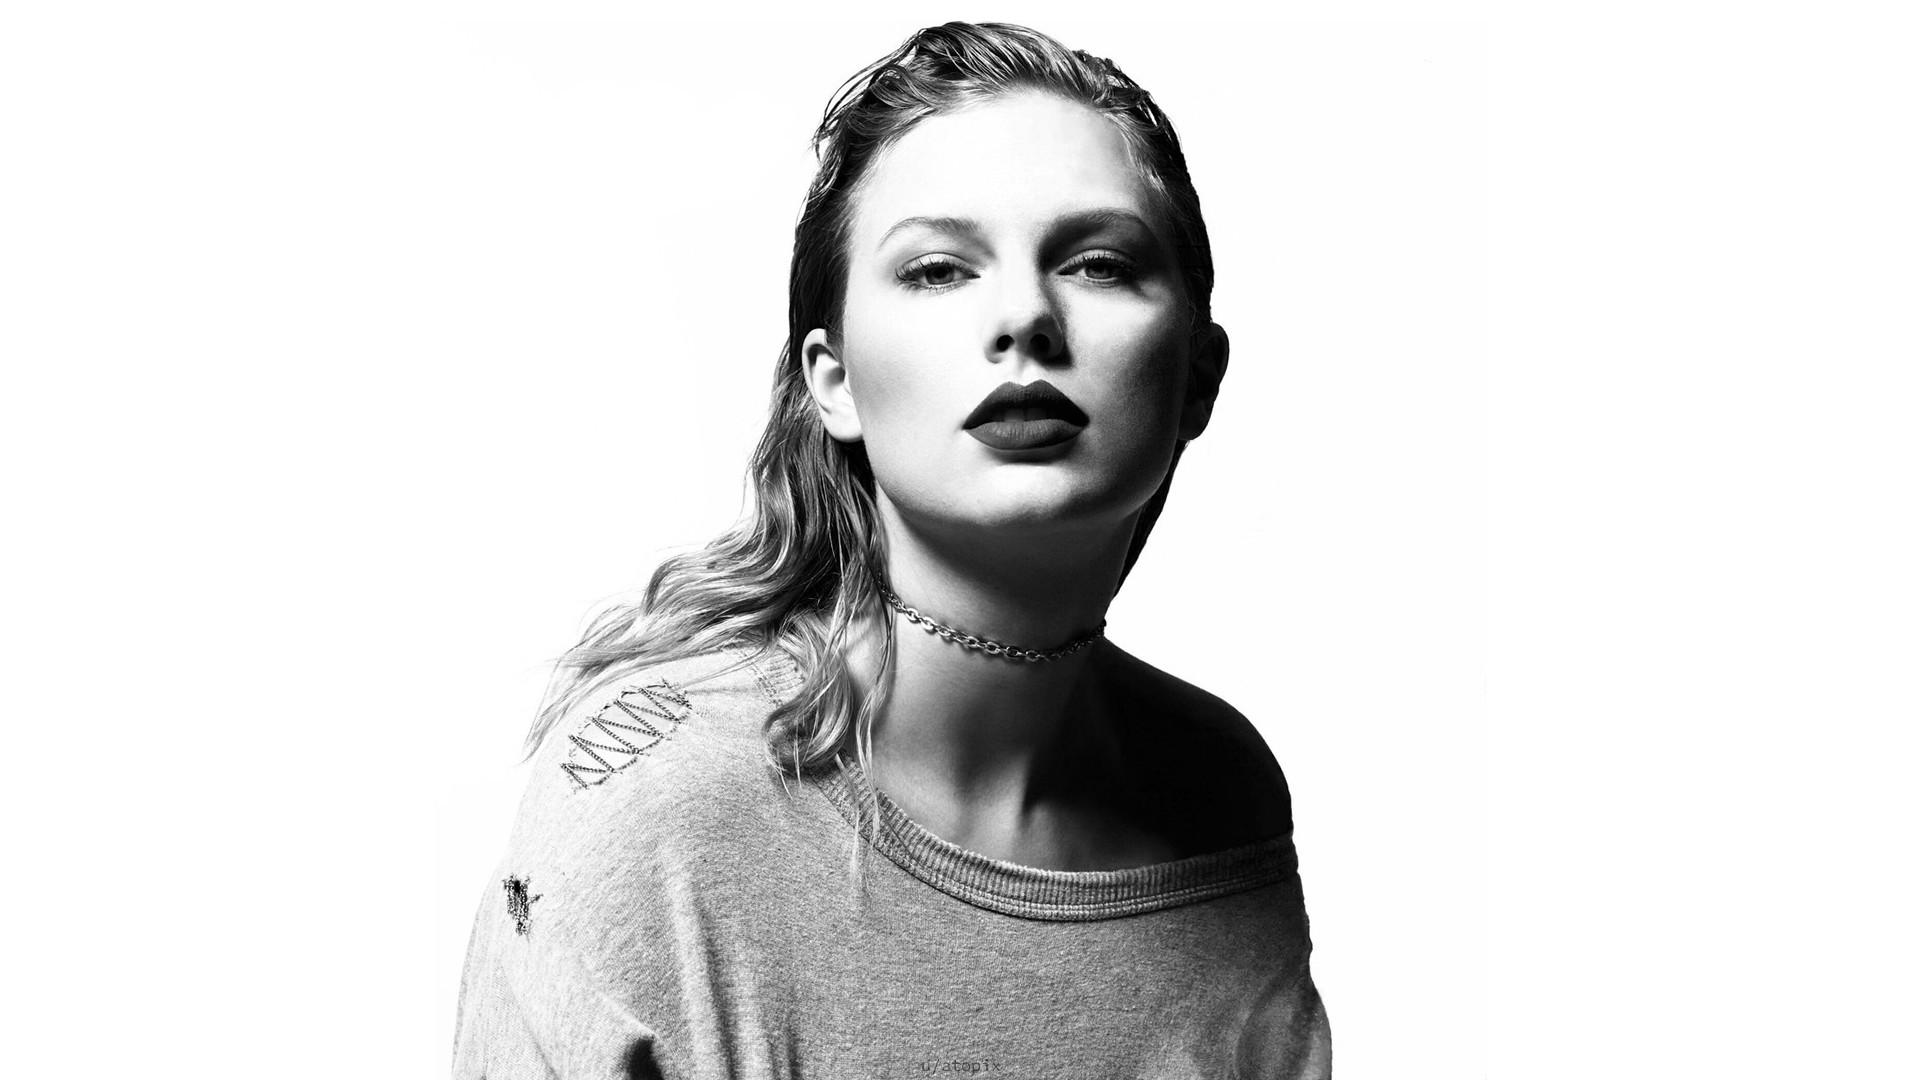 Taylor swift best wallpaper face